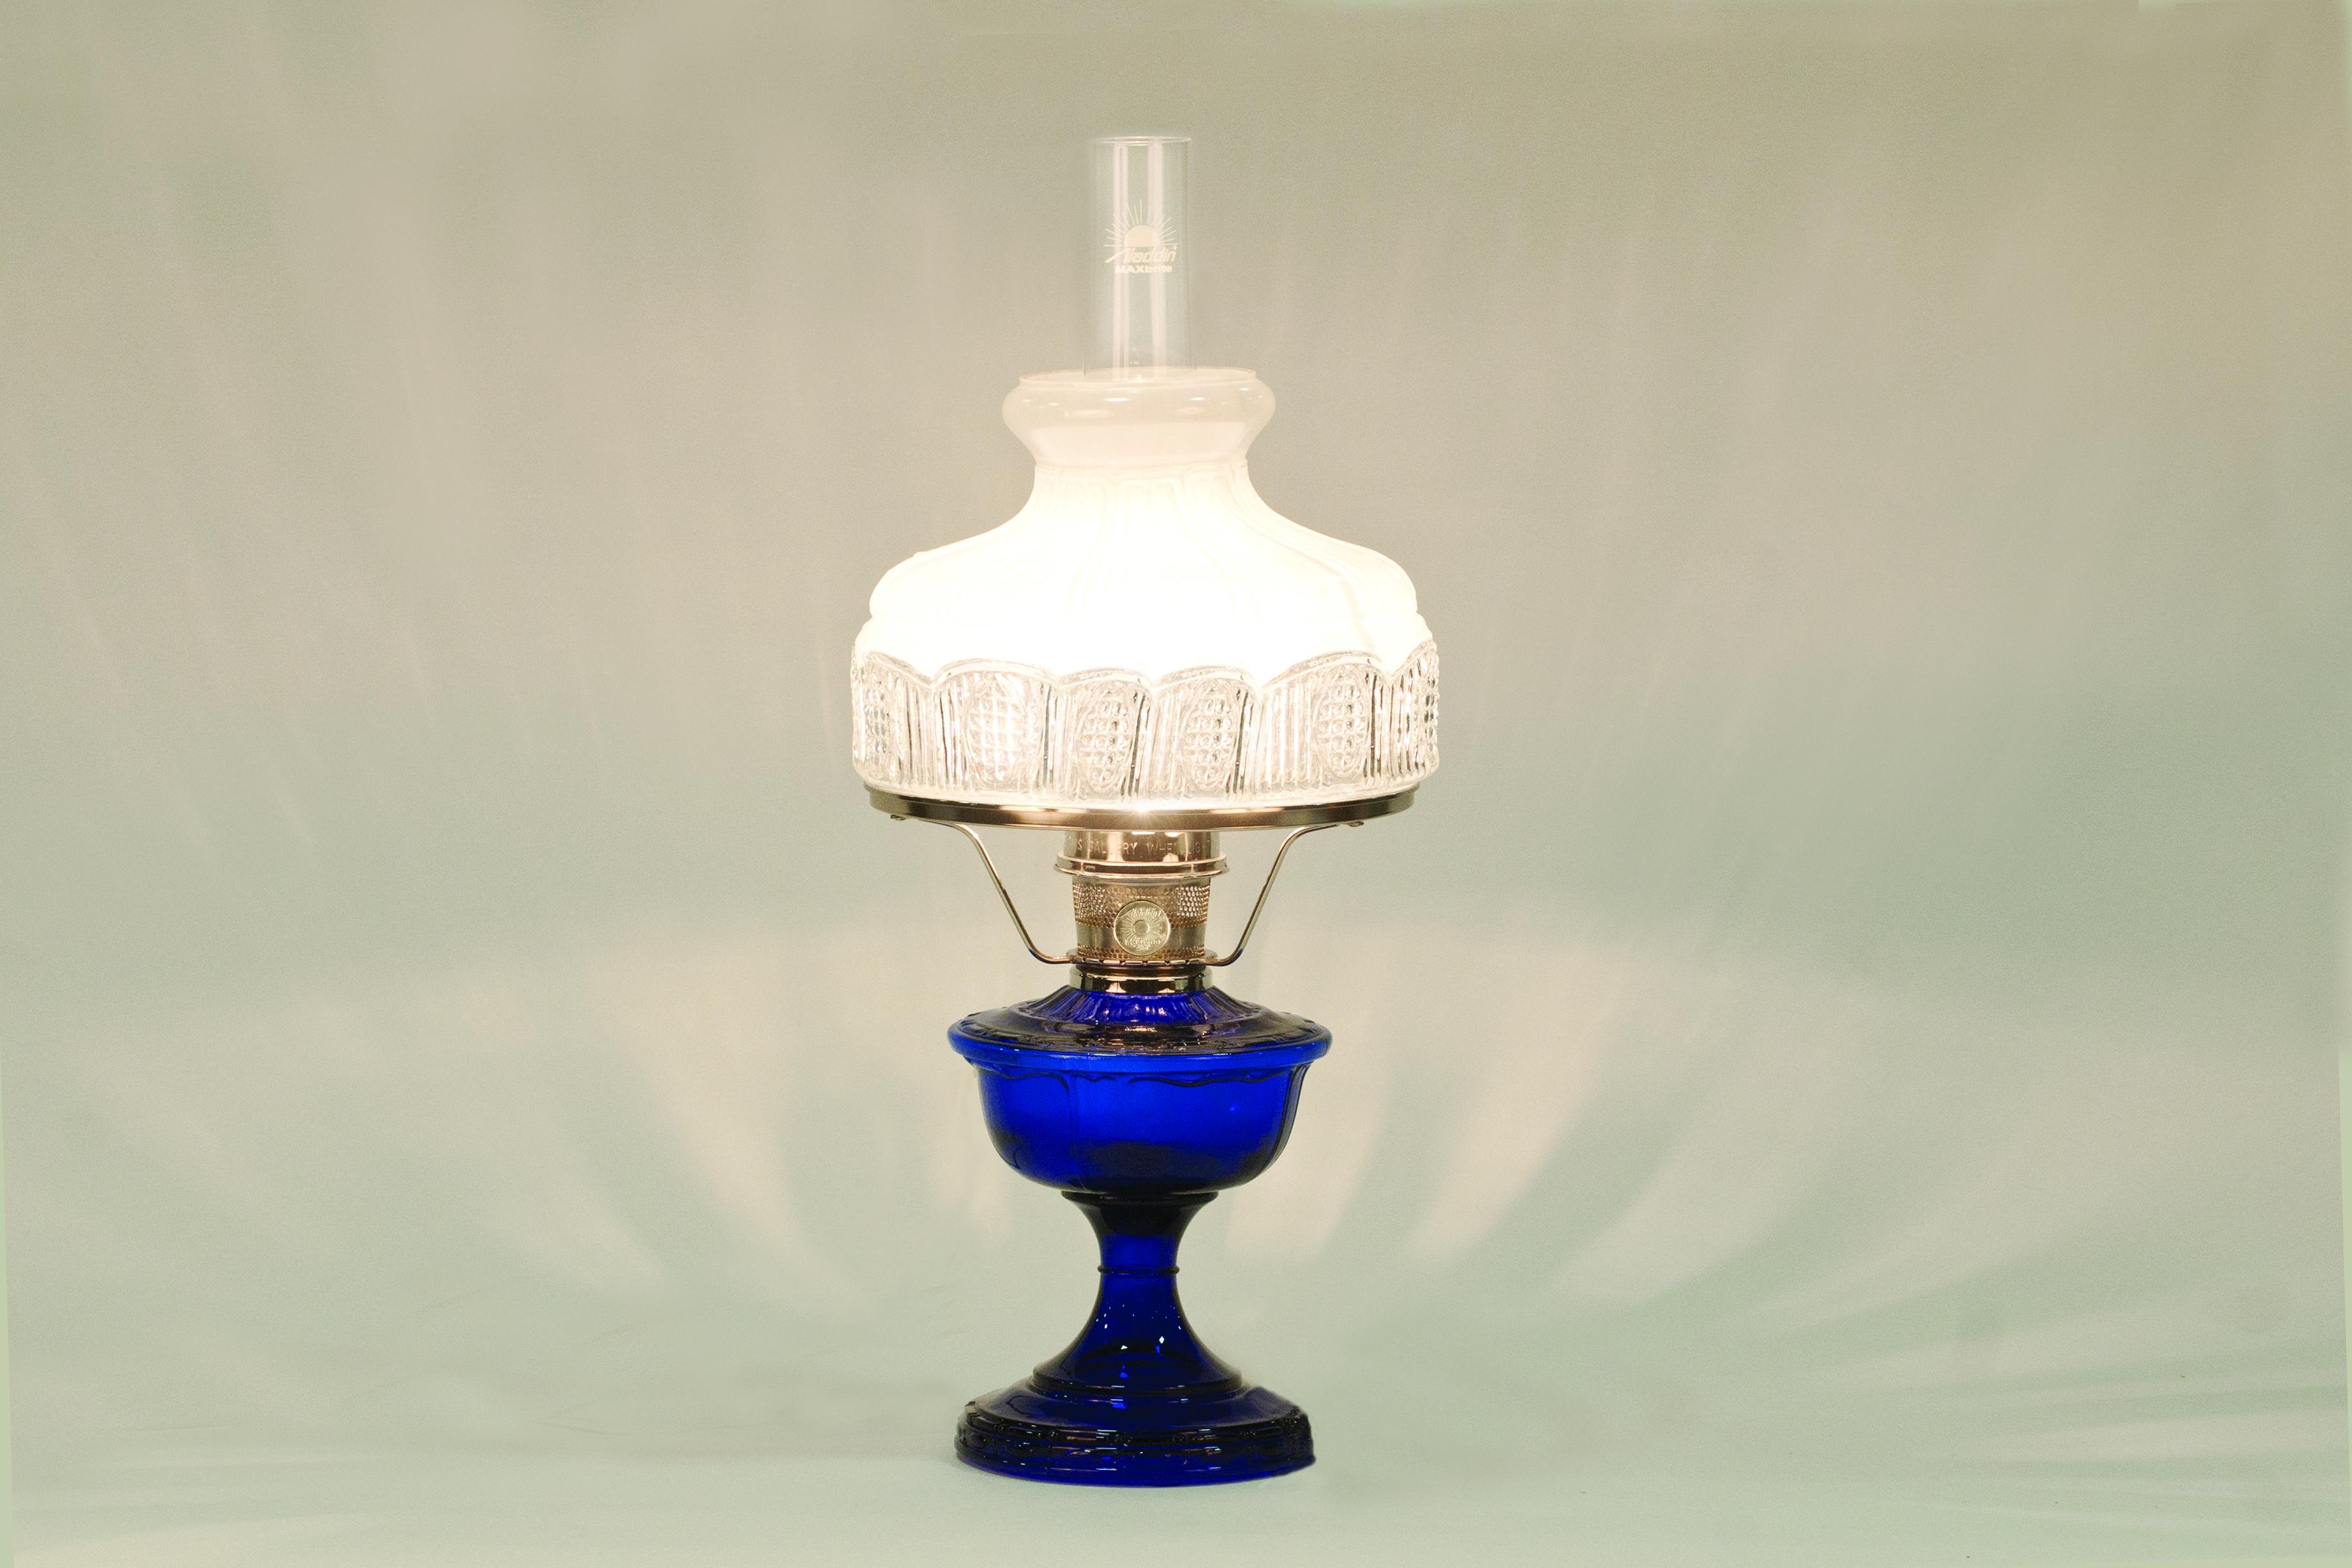 Vb2312n 5019r Aladdin Alexandria Cobalt Nickel Hdwr Lamp